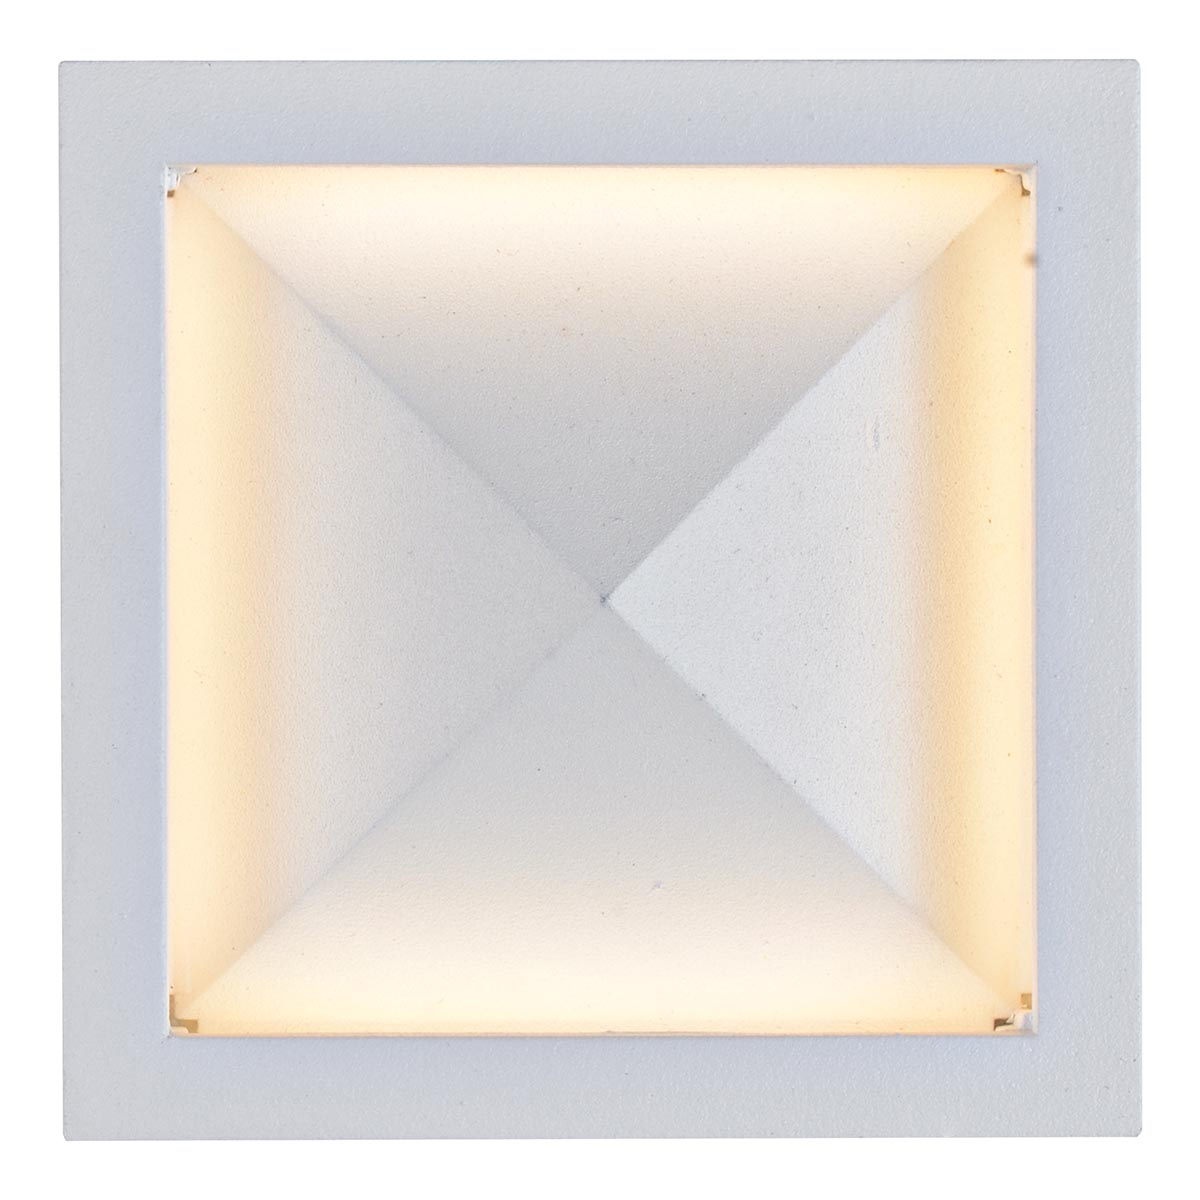 Светильник iLedex SMD-923404 WH-3000K Creator